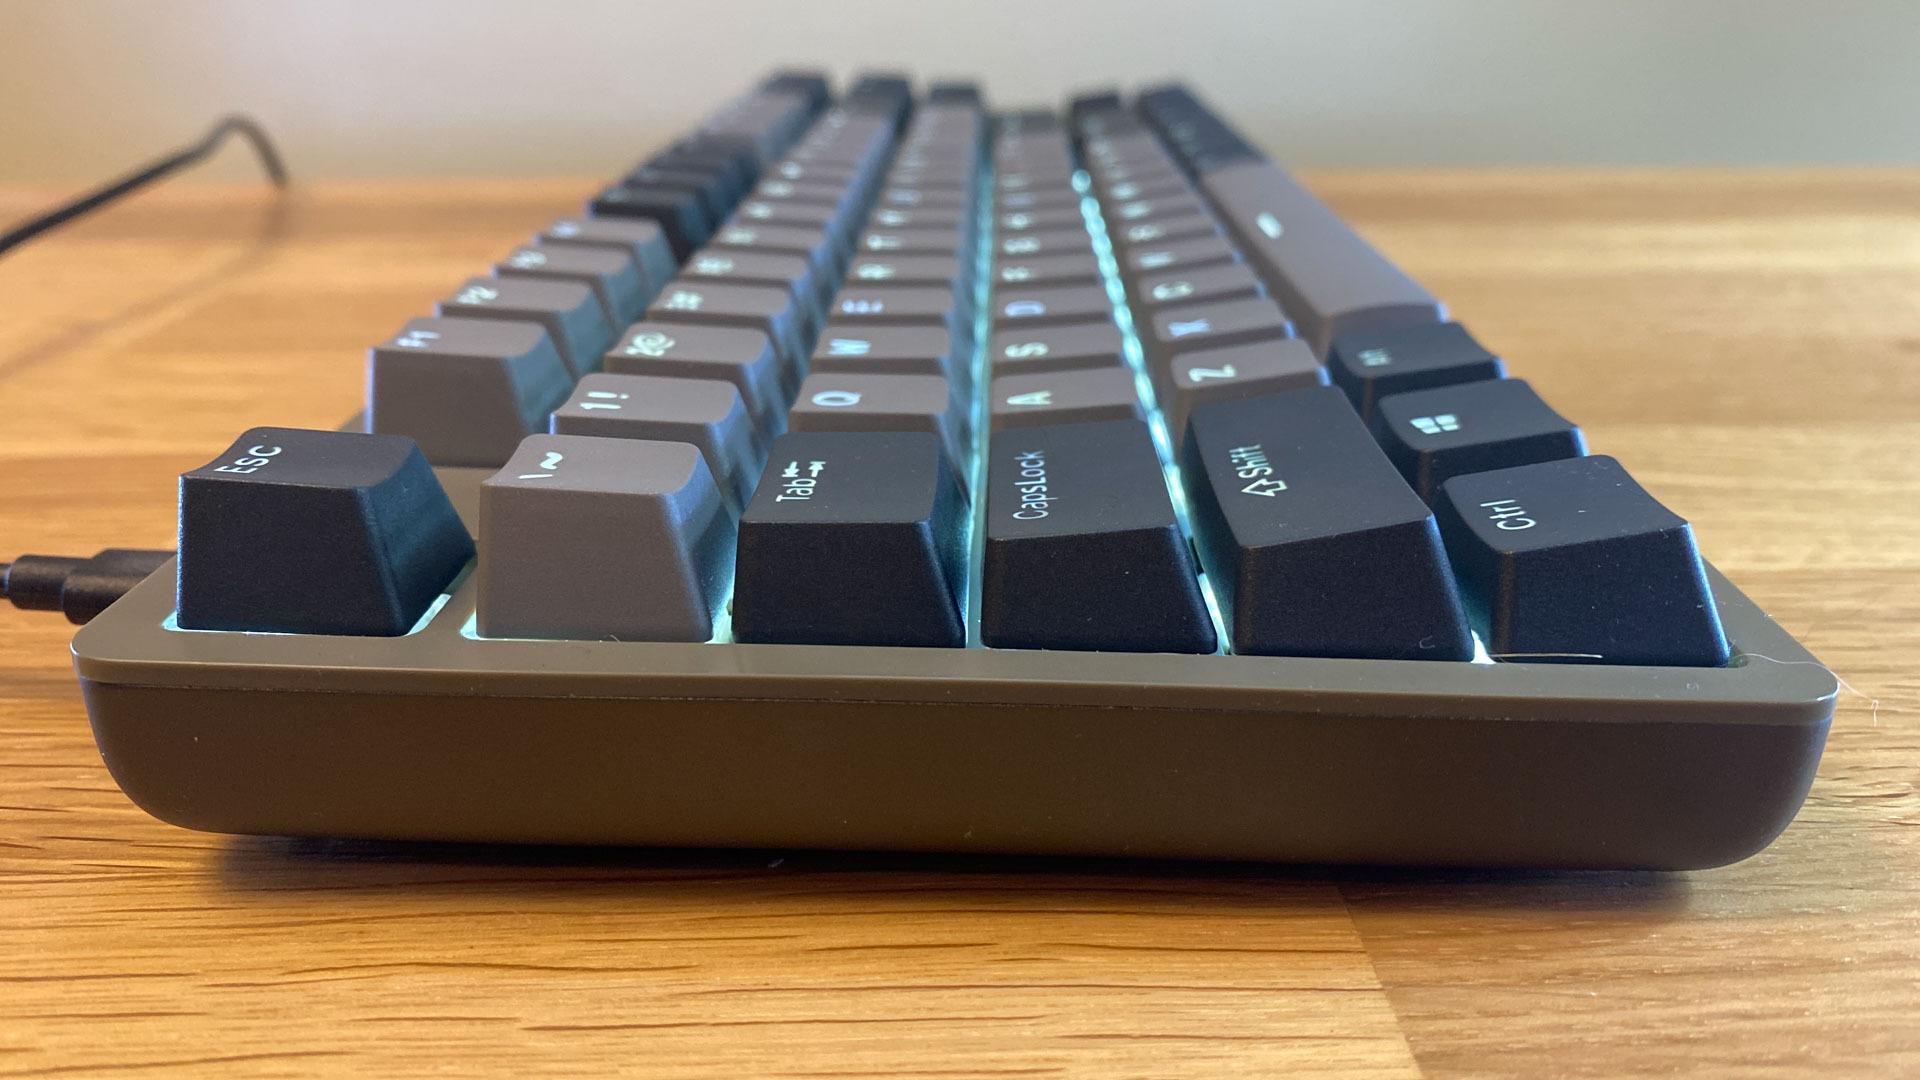 Drop ENTR Mechanical Keyboard - Review 2020 - PCMag Australia